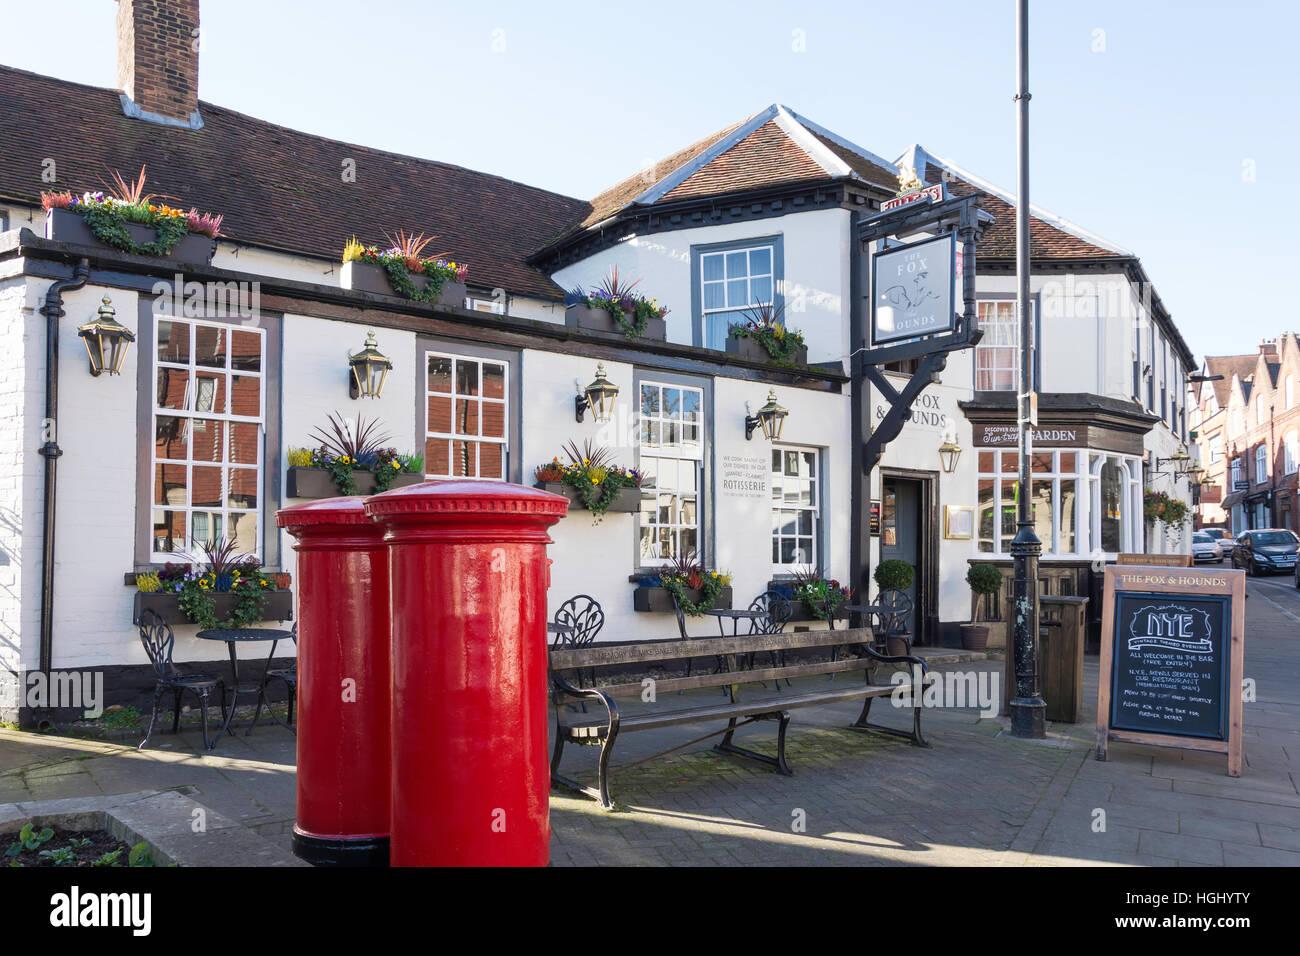 The Fox & Hounds Pub, High Street, Lyndhurst, Hampshire, England, United Kingdom - Stock Image